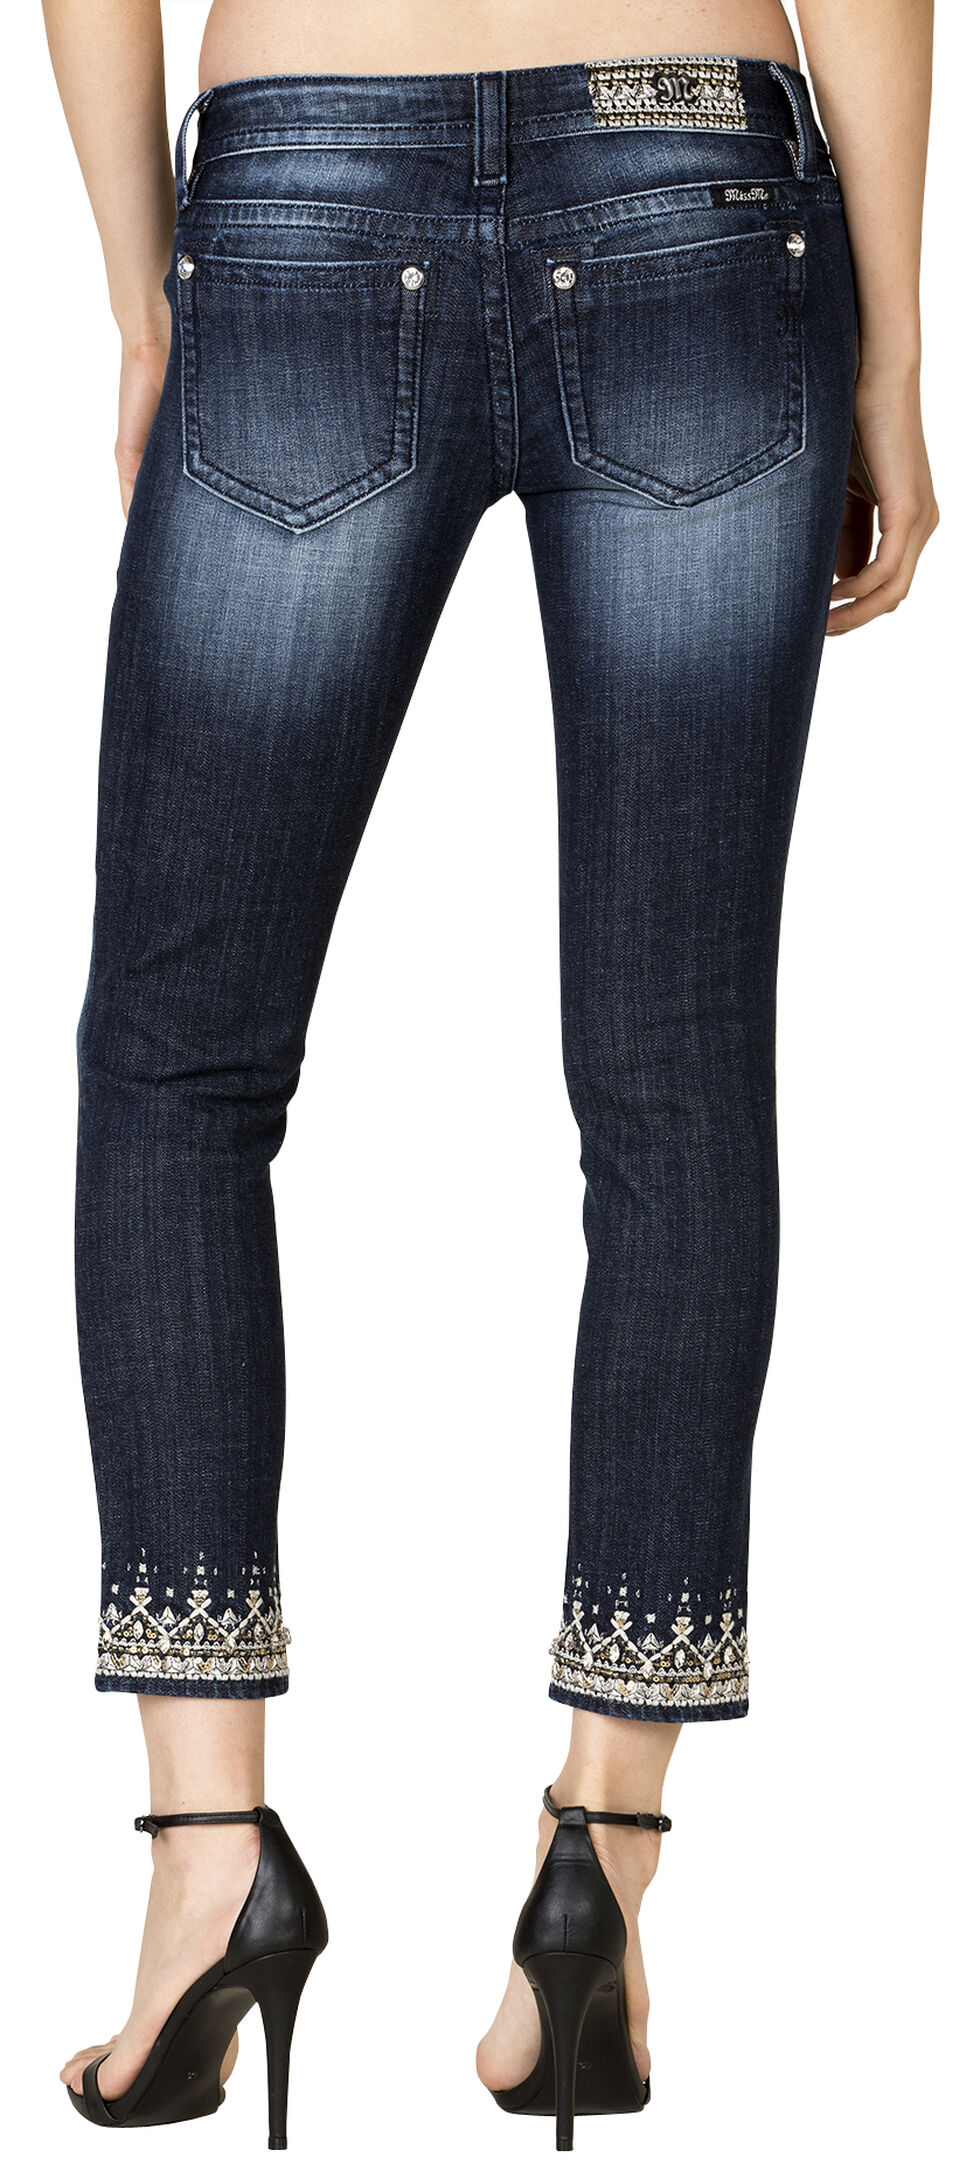 Miss Me Women's Regal Realness Ankle Skinny Jeans, Blue, hi-res